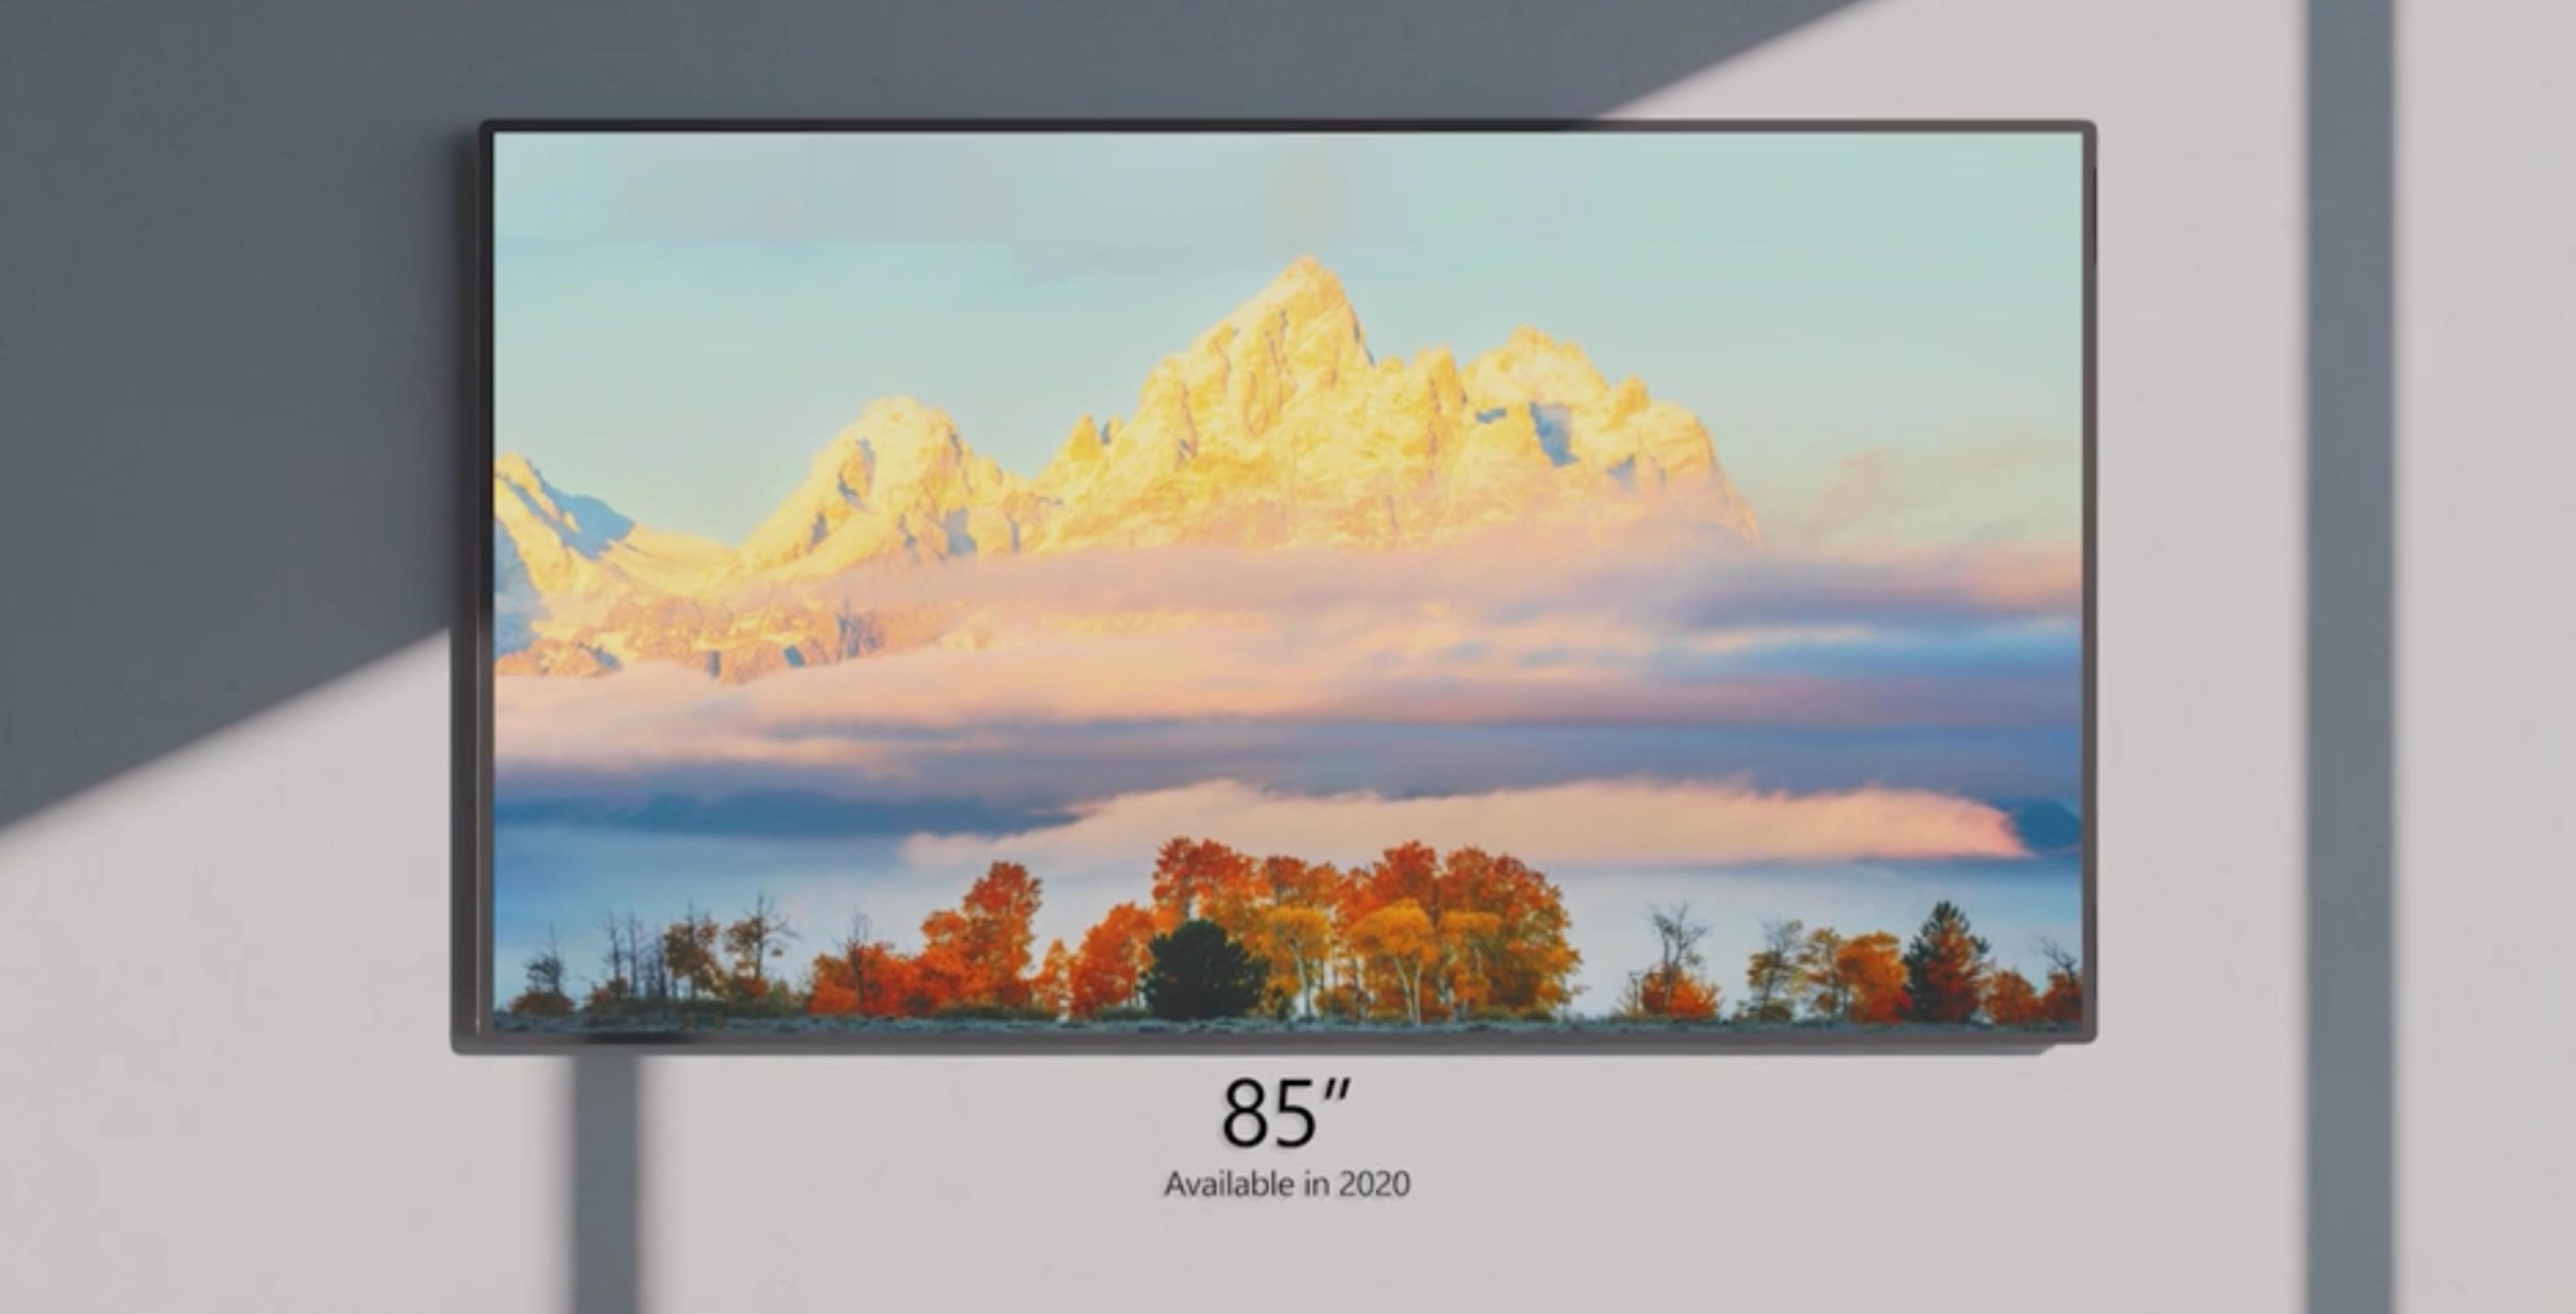 Microsoft 85-inch Surface Hub 2S